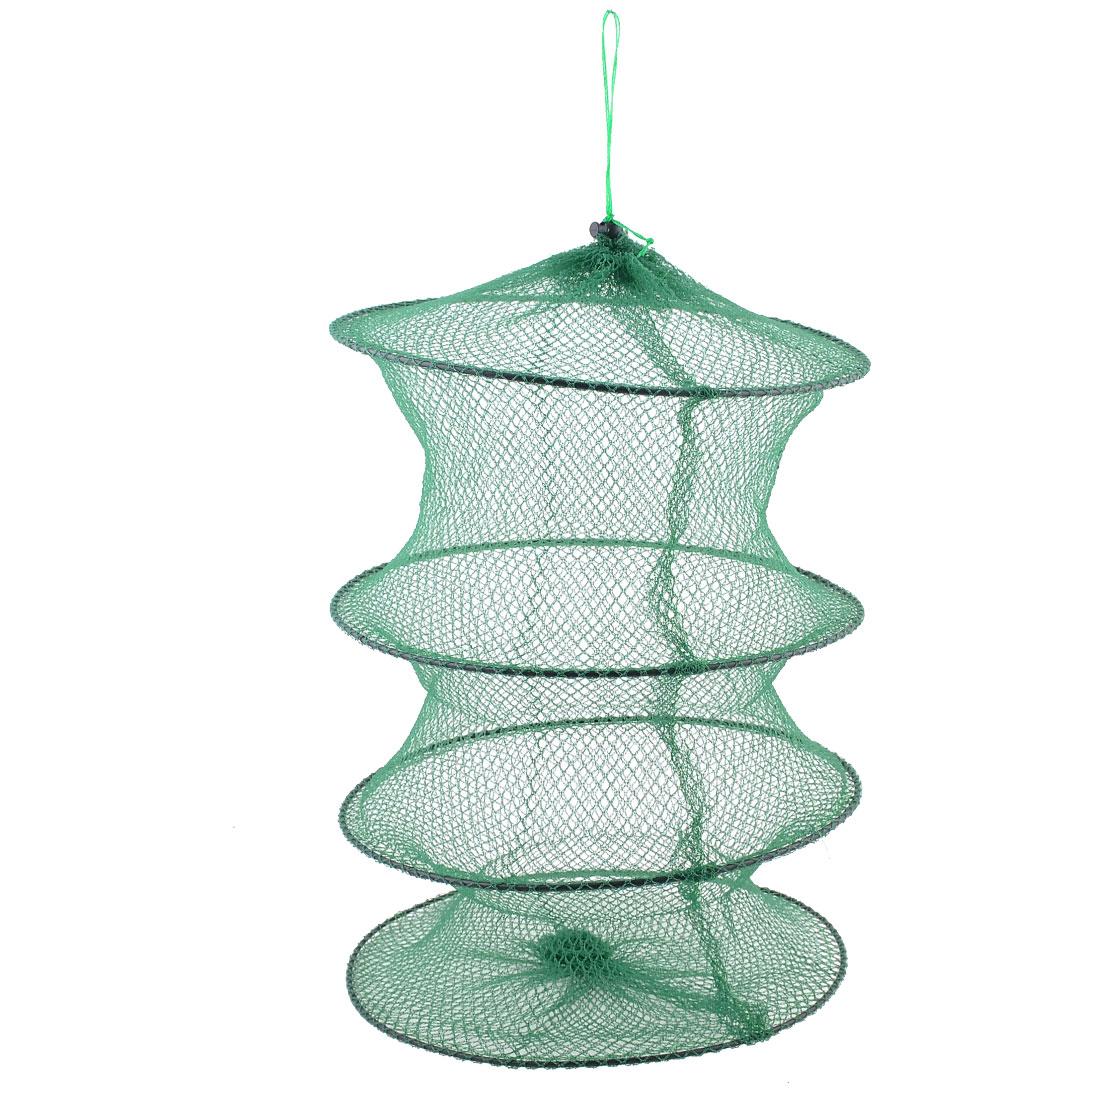 Green 3 Sections Folding Crawfish Lobster Crab Fishing Keep Net